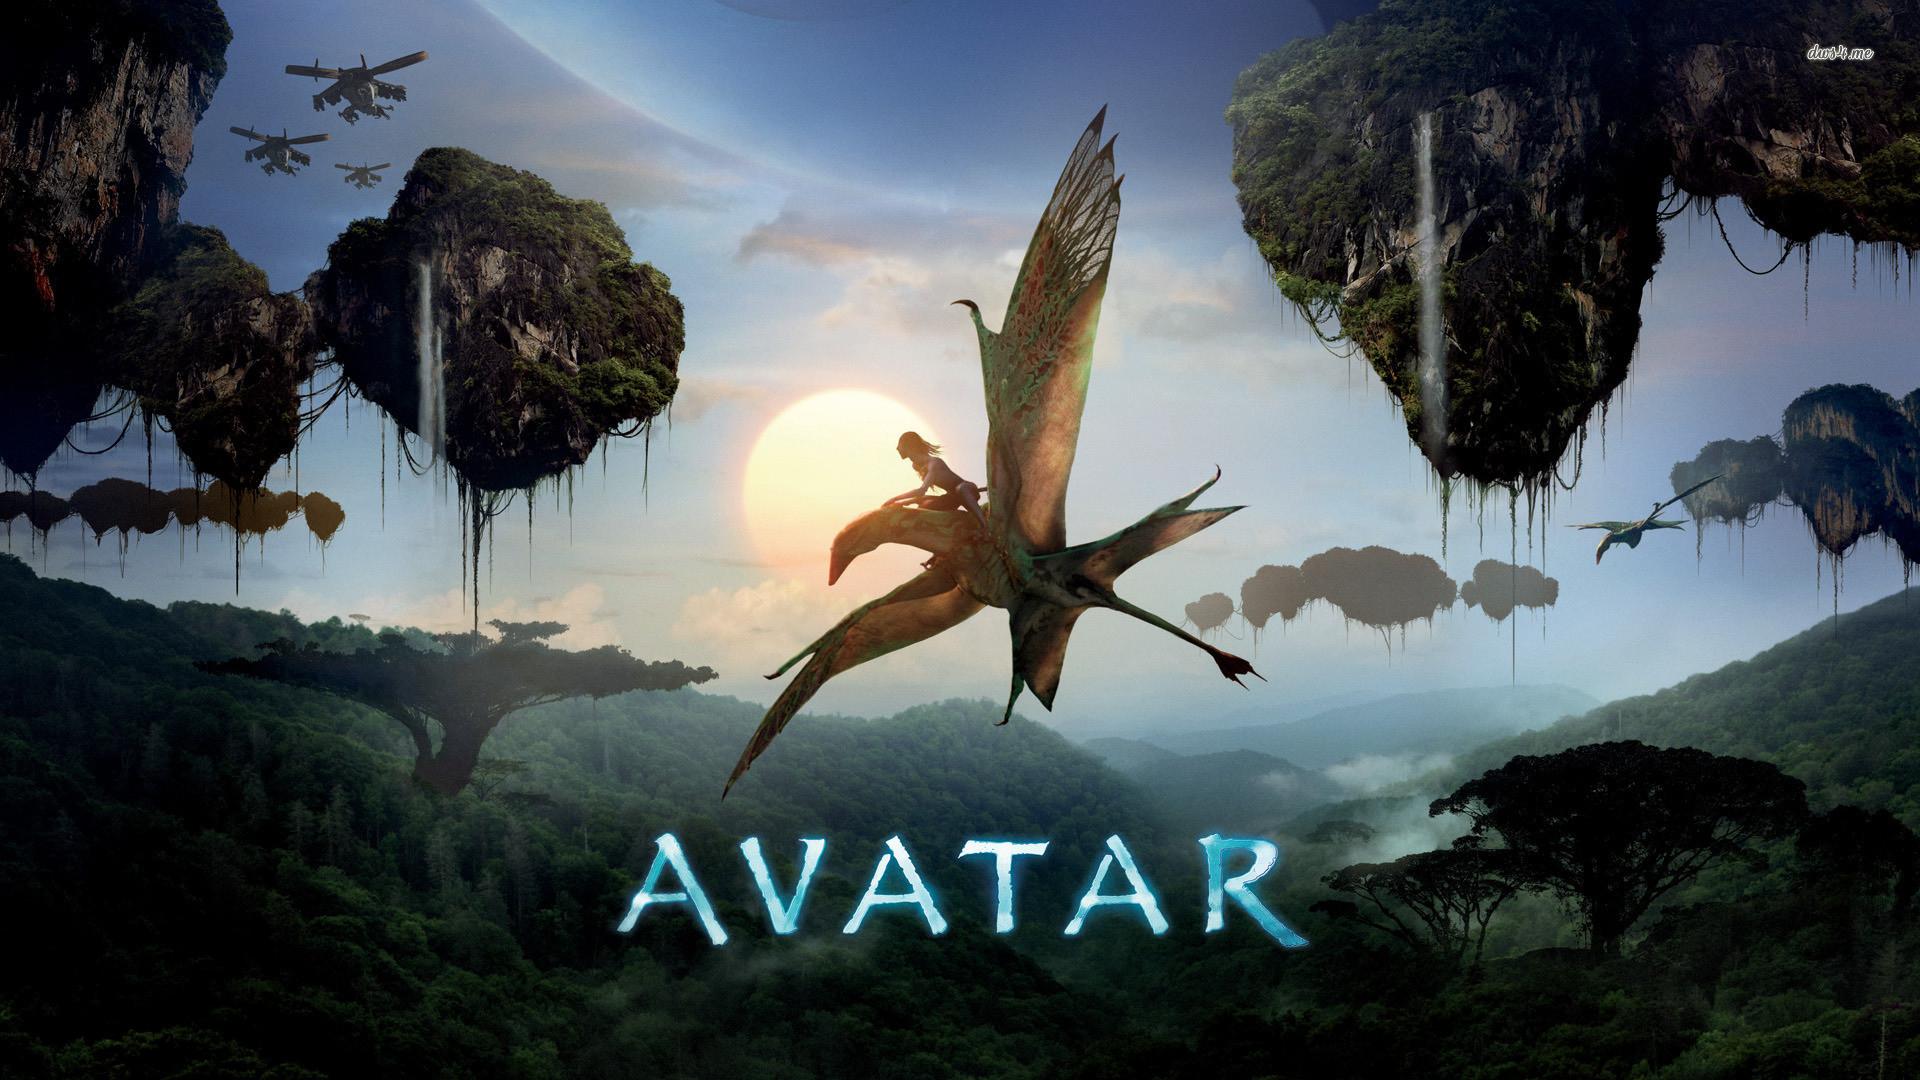 1000+ images about Avatar movie on Pinterest | Avatar fan art .